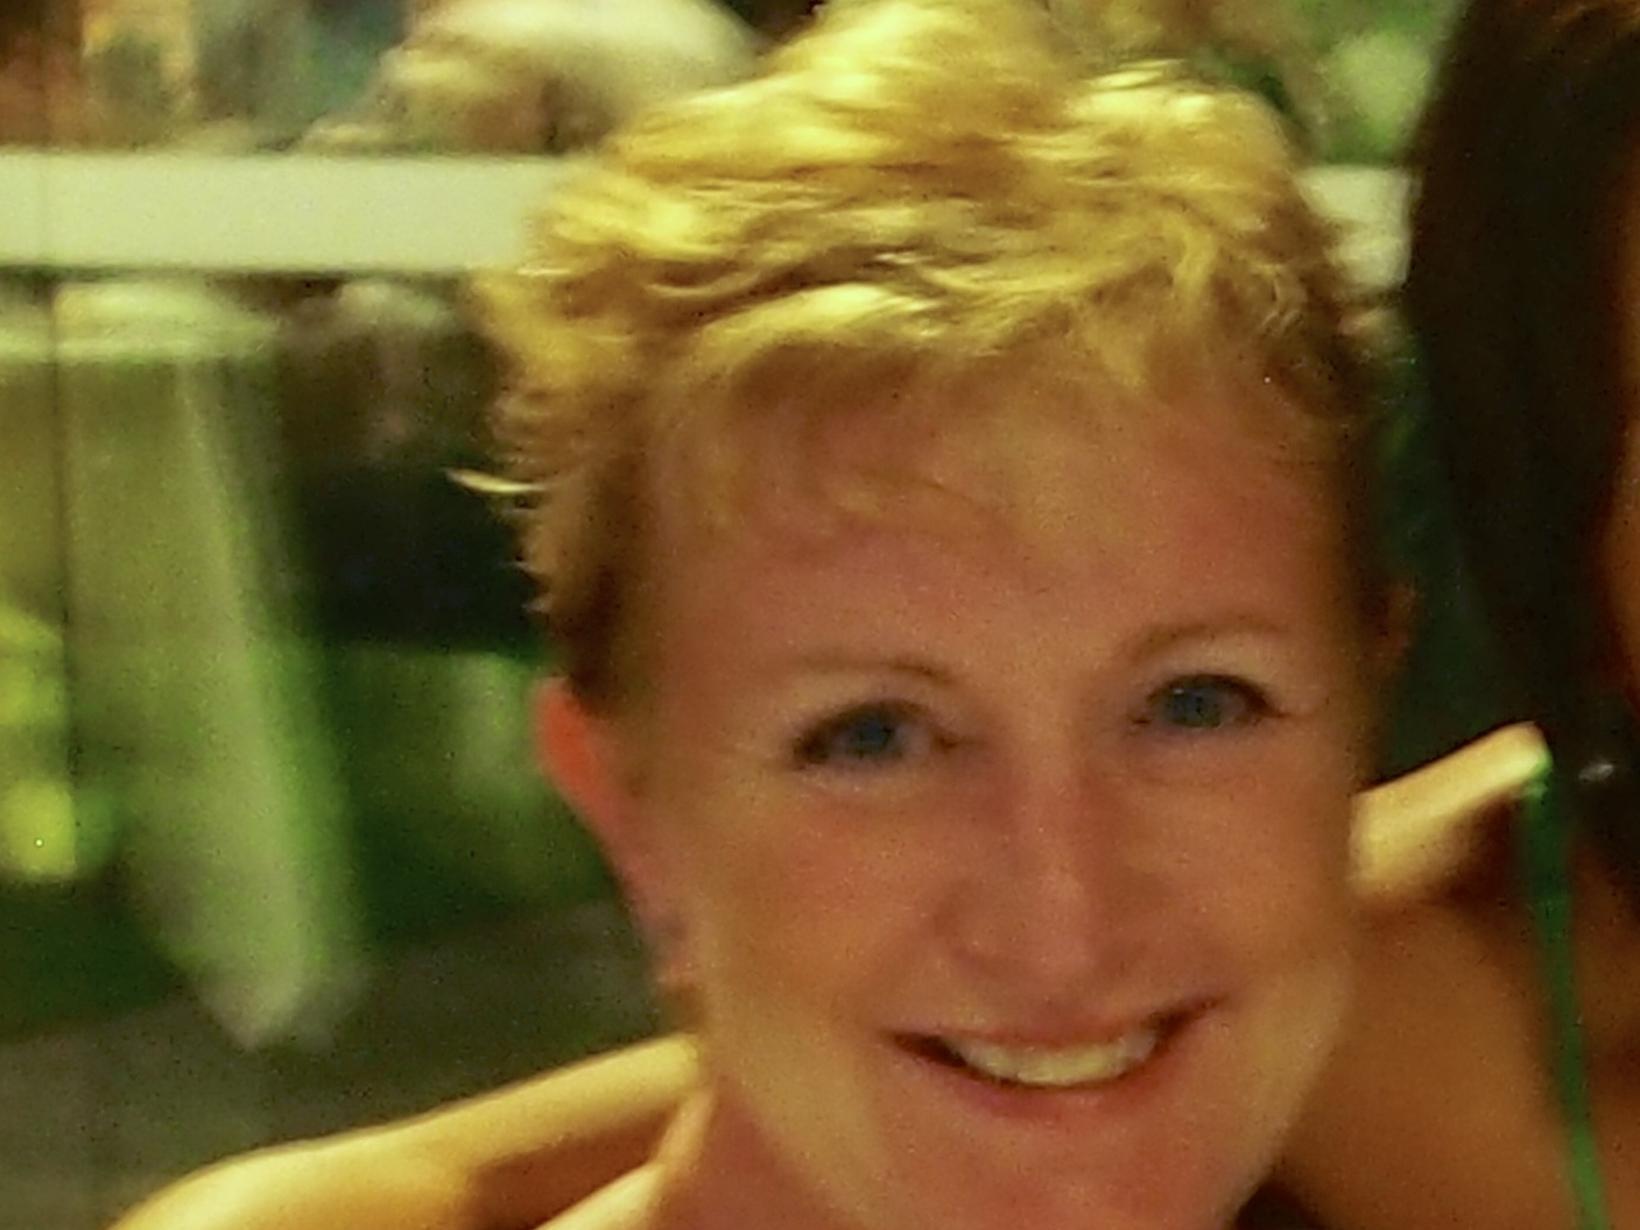 Freida from Brisbane, Queensland, Australia